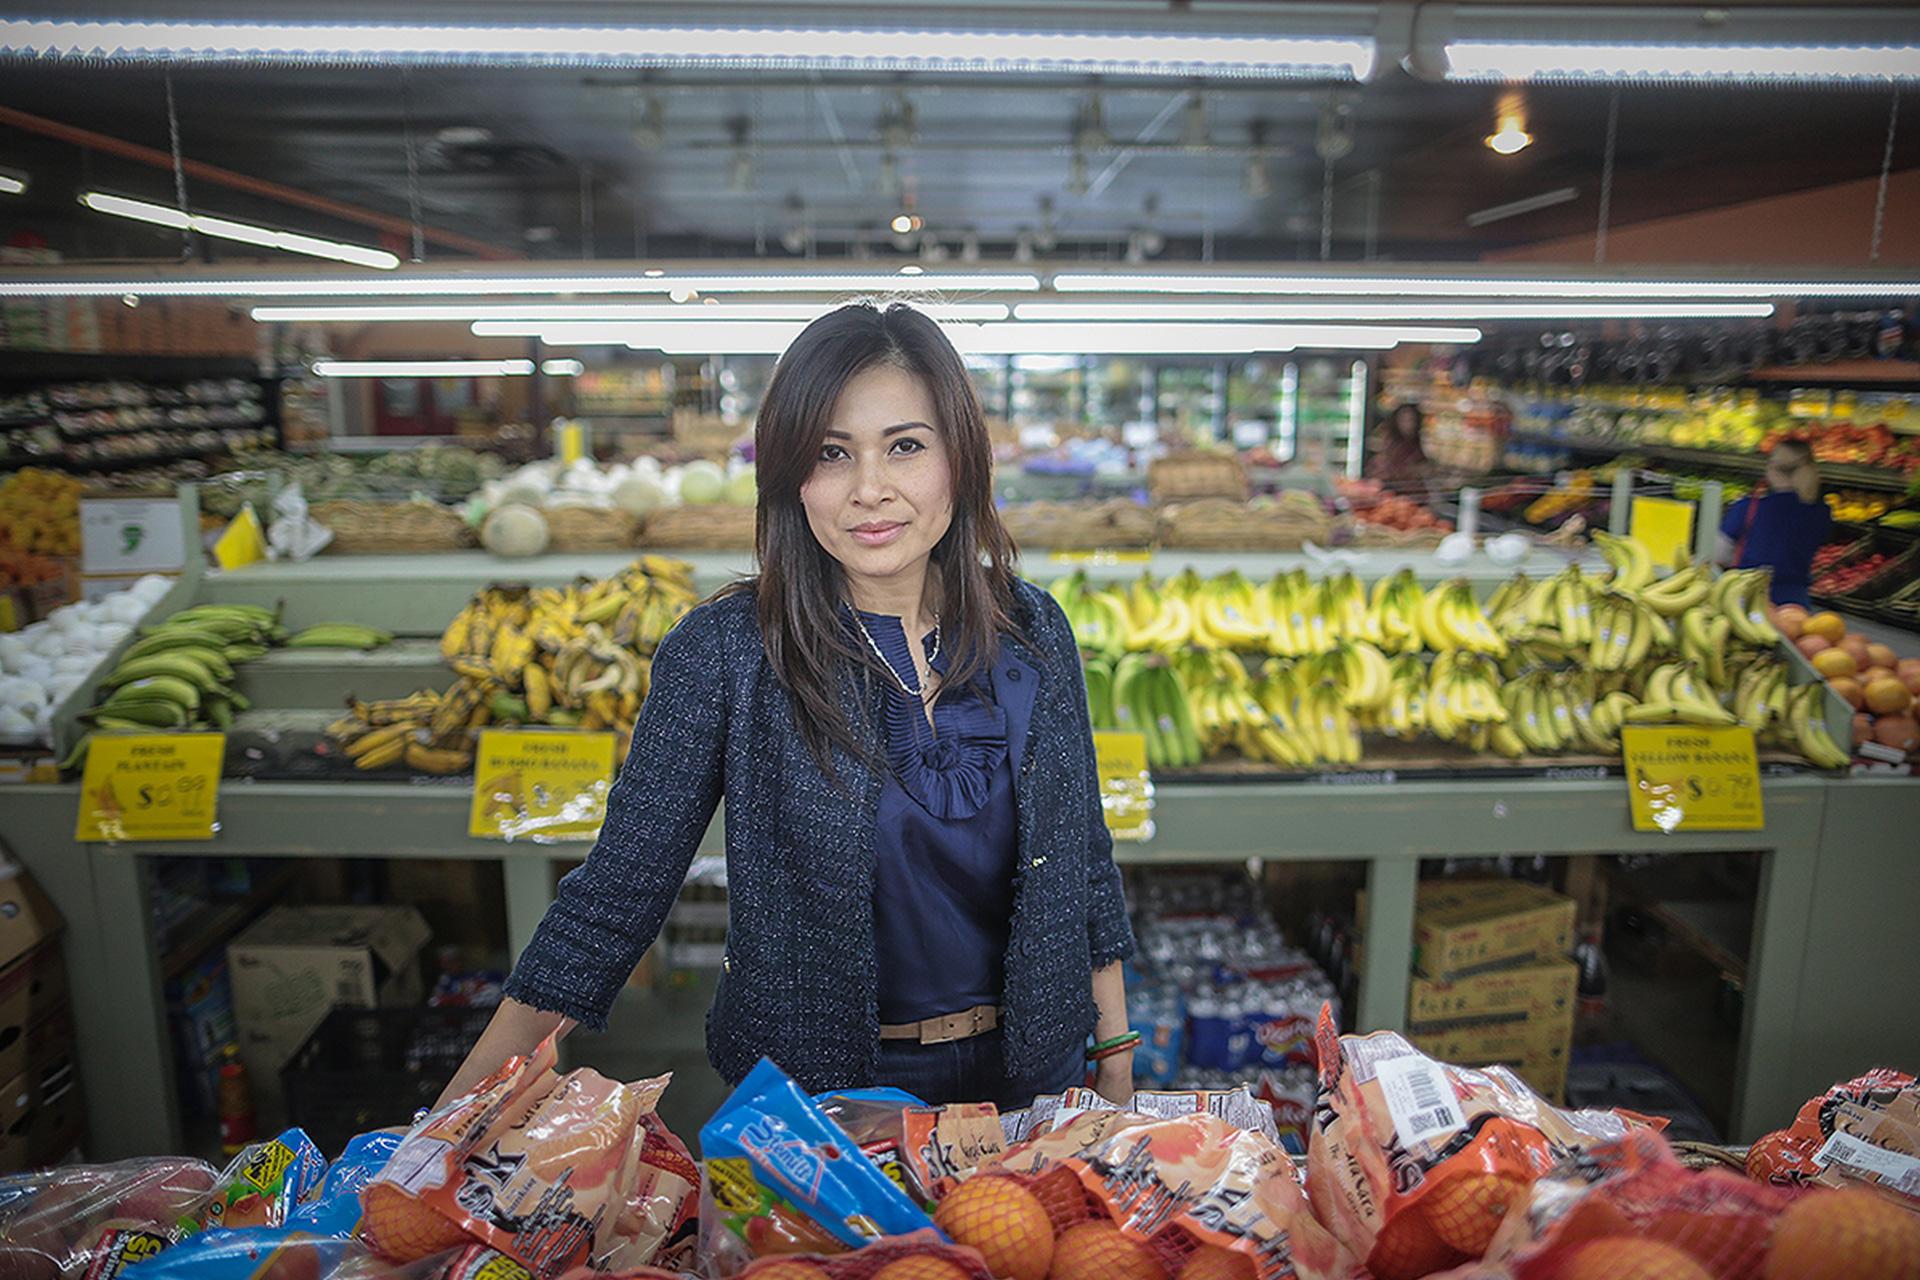 Karina inside the Viet Hoa Food Market on Cleveland.